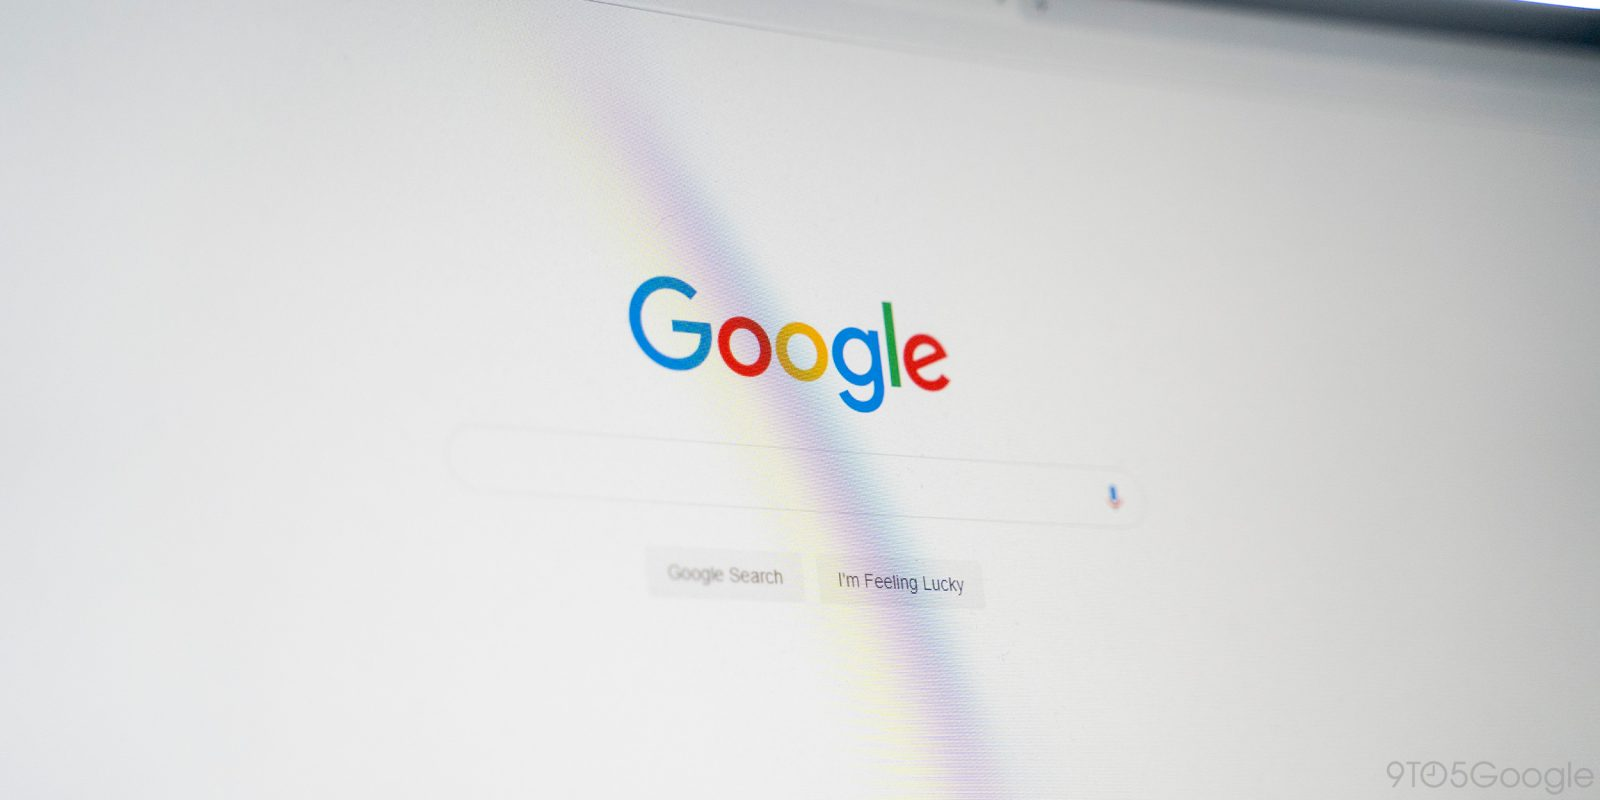 Google Chrome - 9to5Google